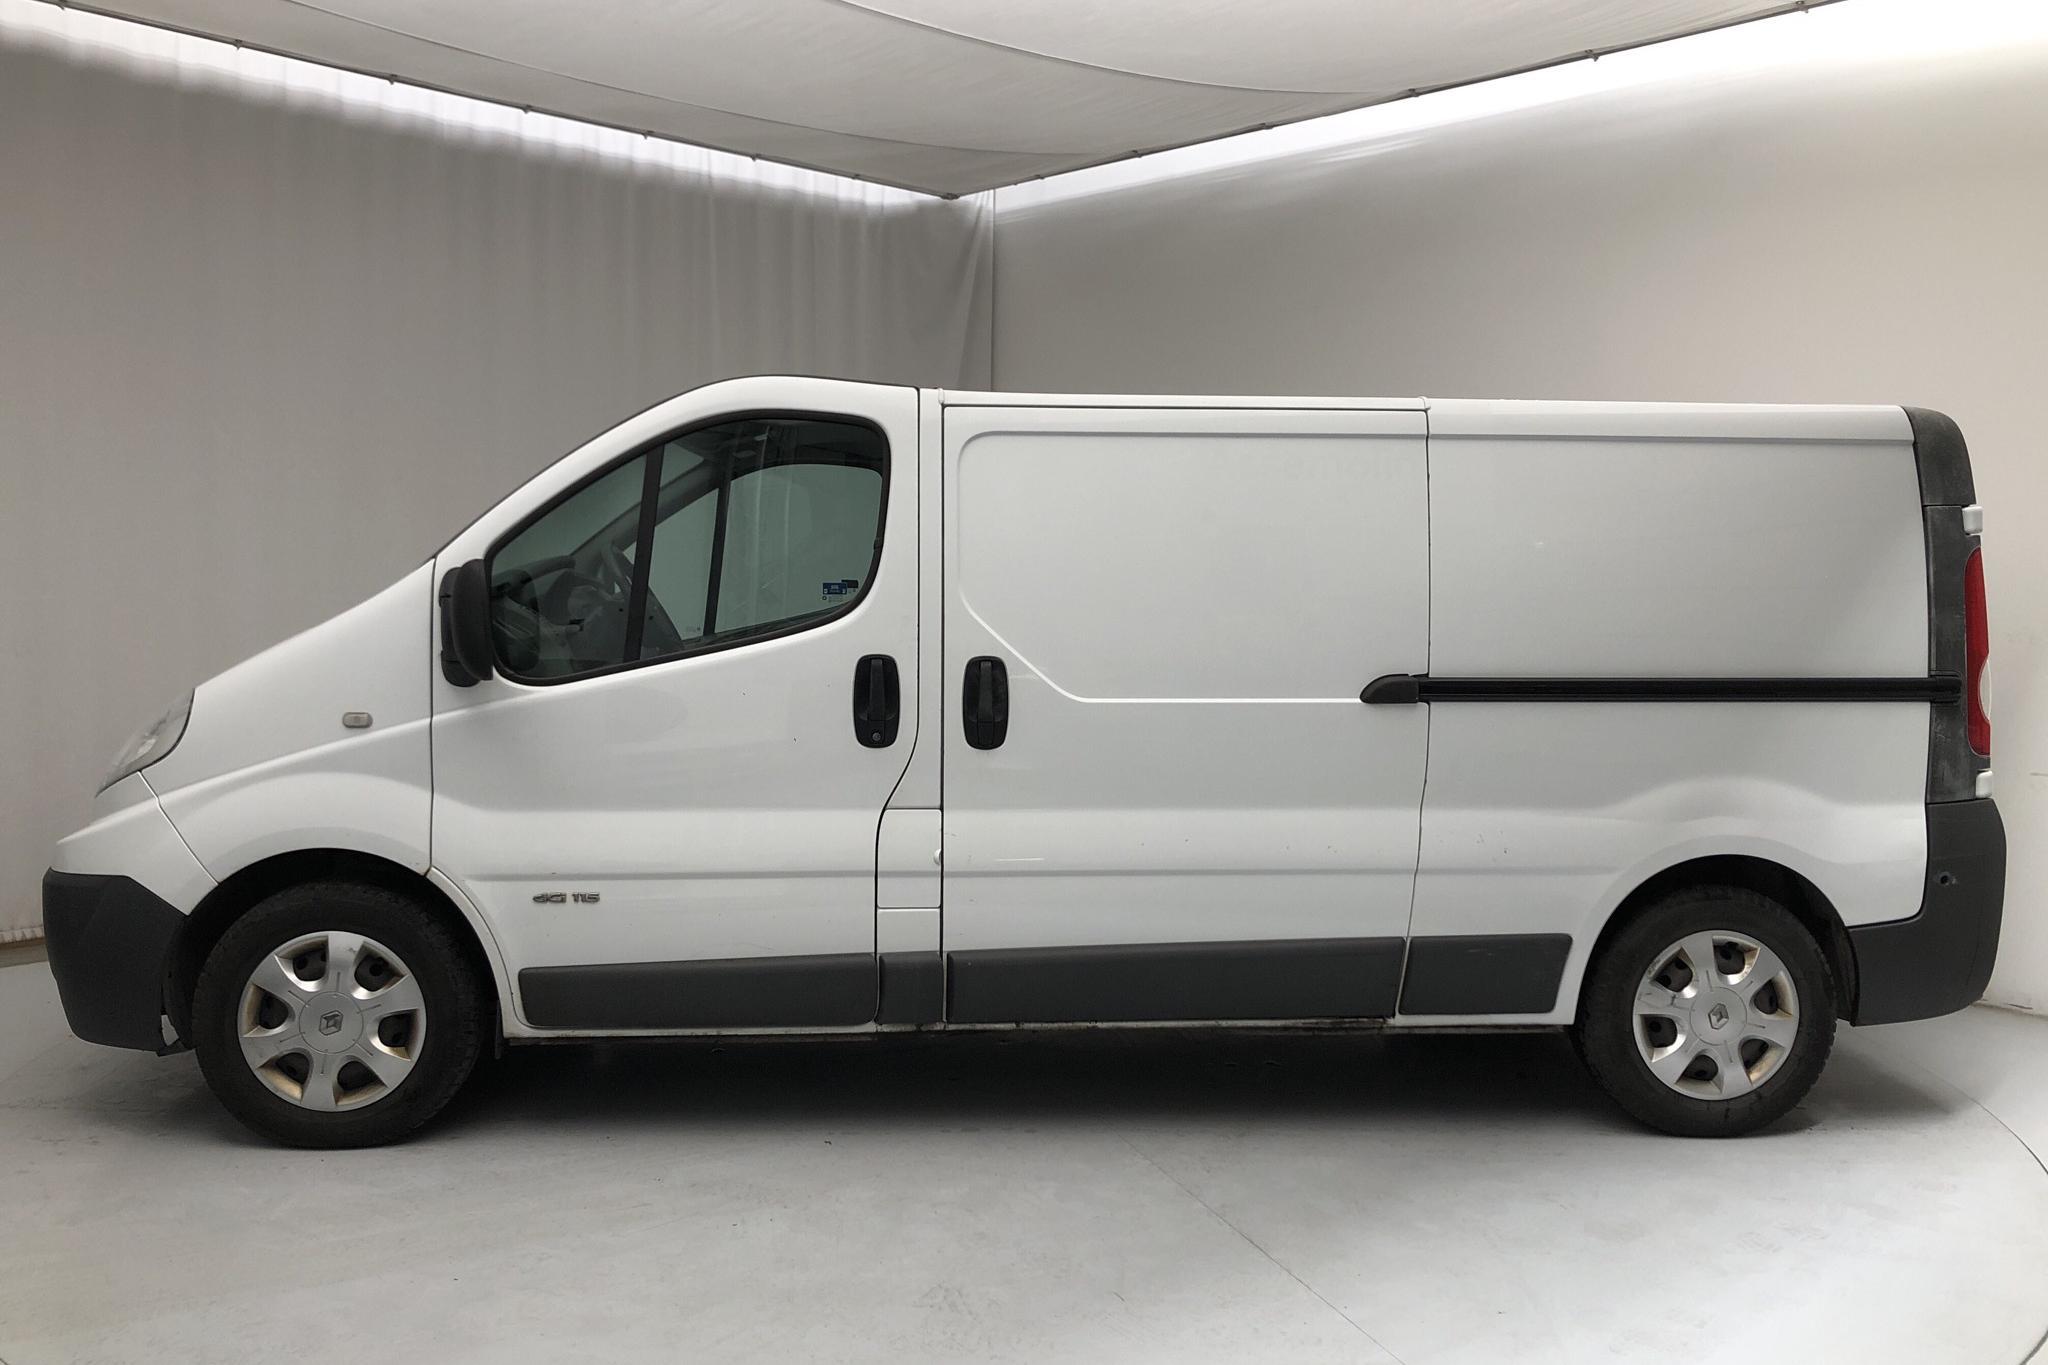 Renault Trafic 2.0 dCi Skåp/Buss (115hk) - 13 423 mil - Automat - vit - 2012